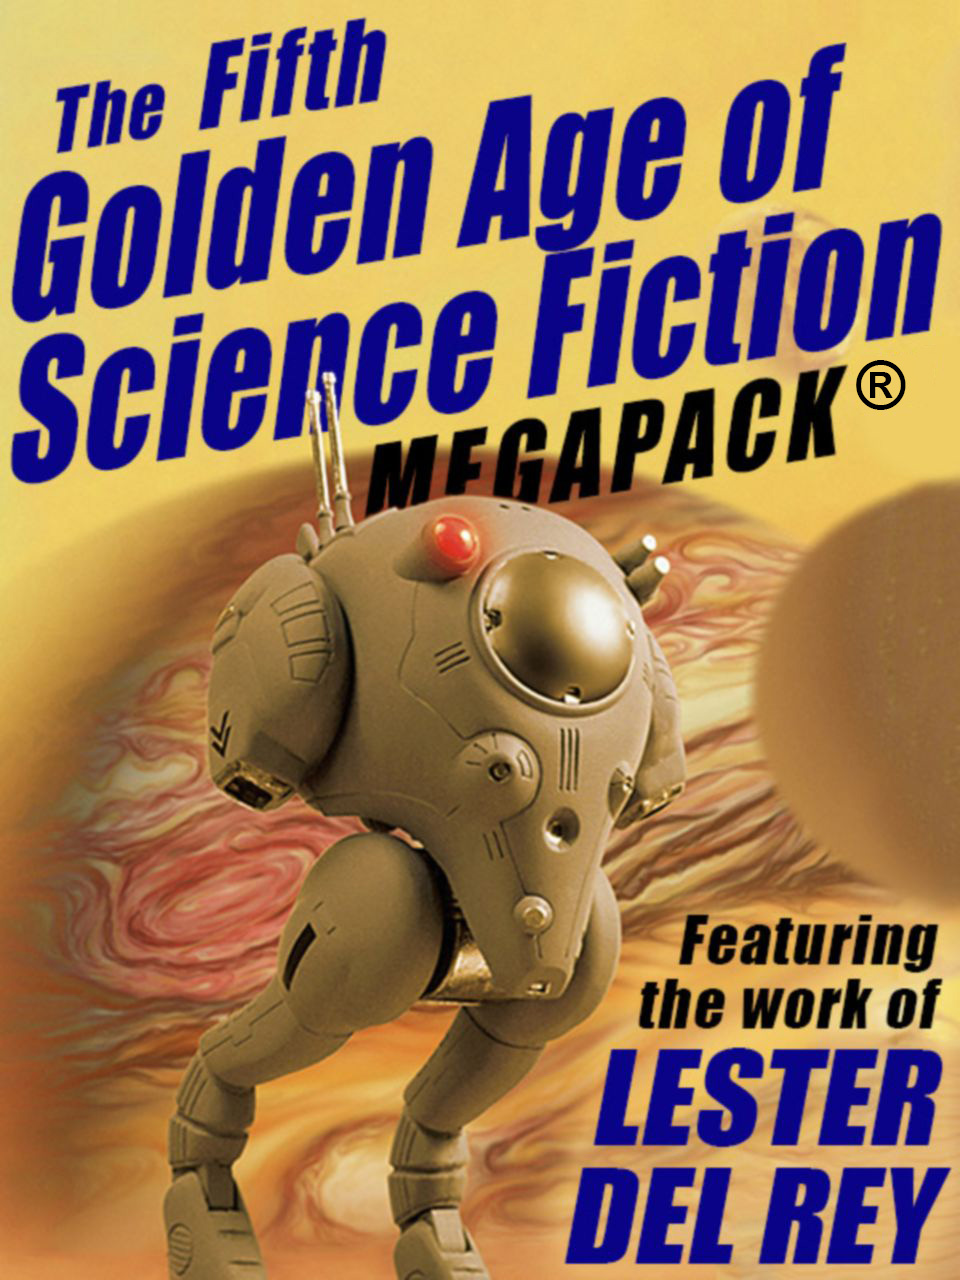 Cover Image of The Fifth Golden Age of Science Fiction MEGAPACK ª: Lester del Rey